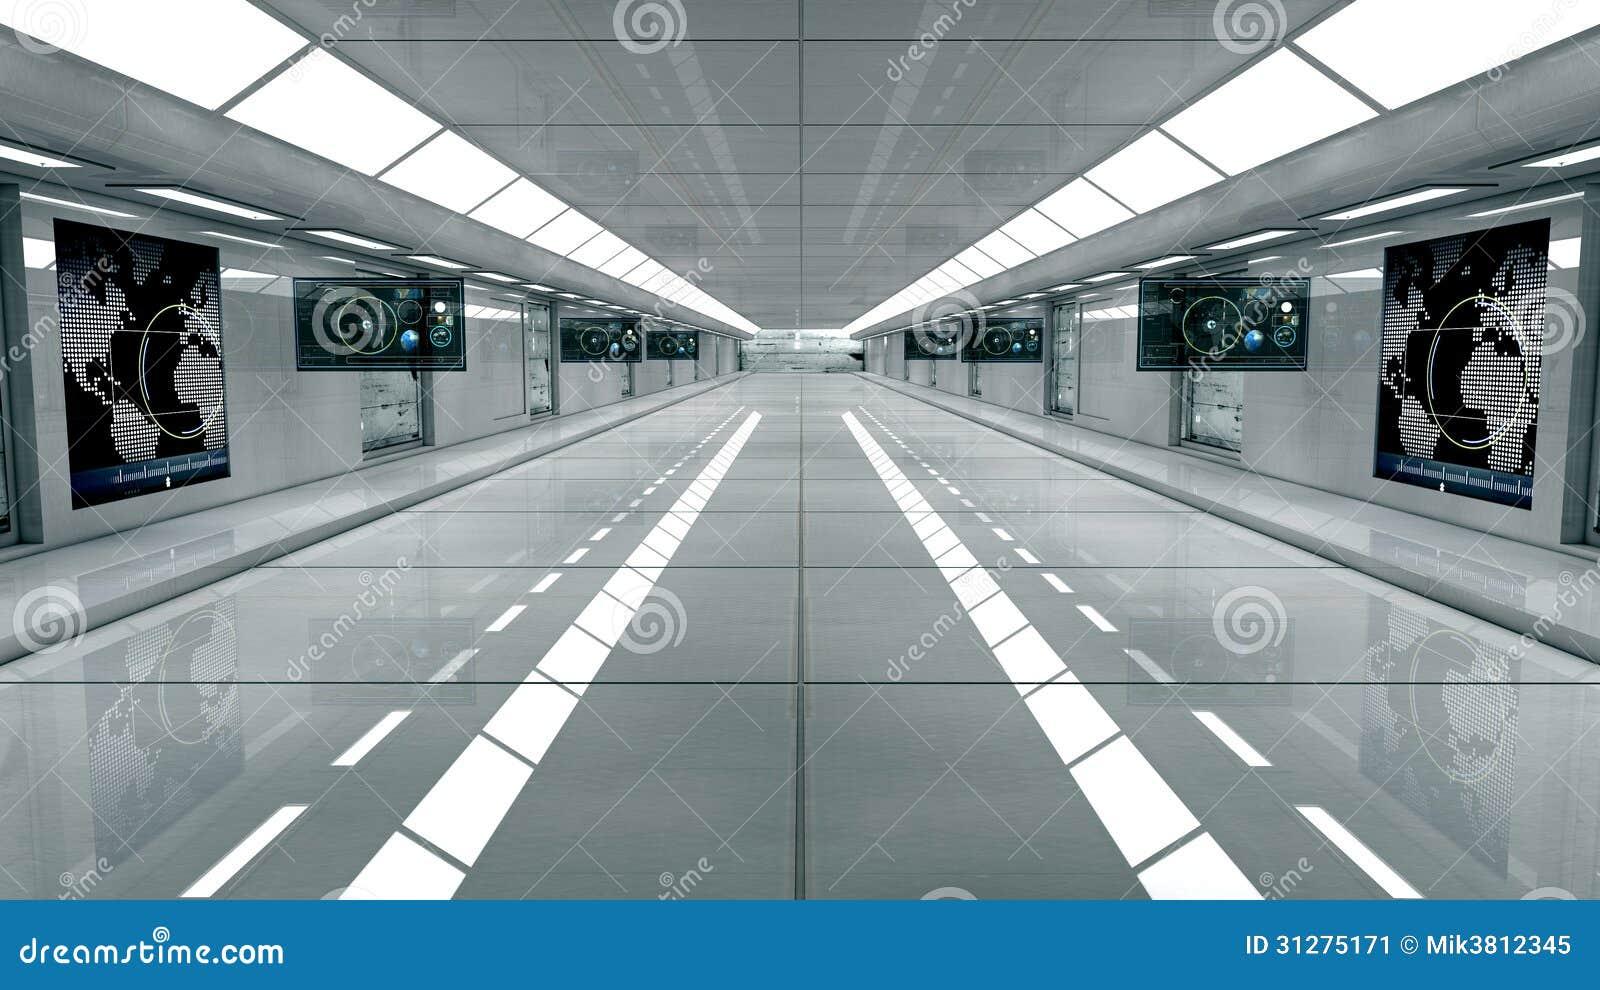 Futuristic interior stock illustration image of for Architecture interieur 3d